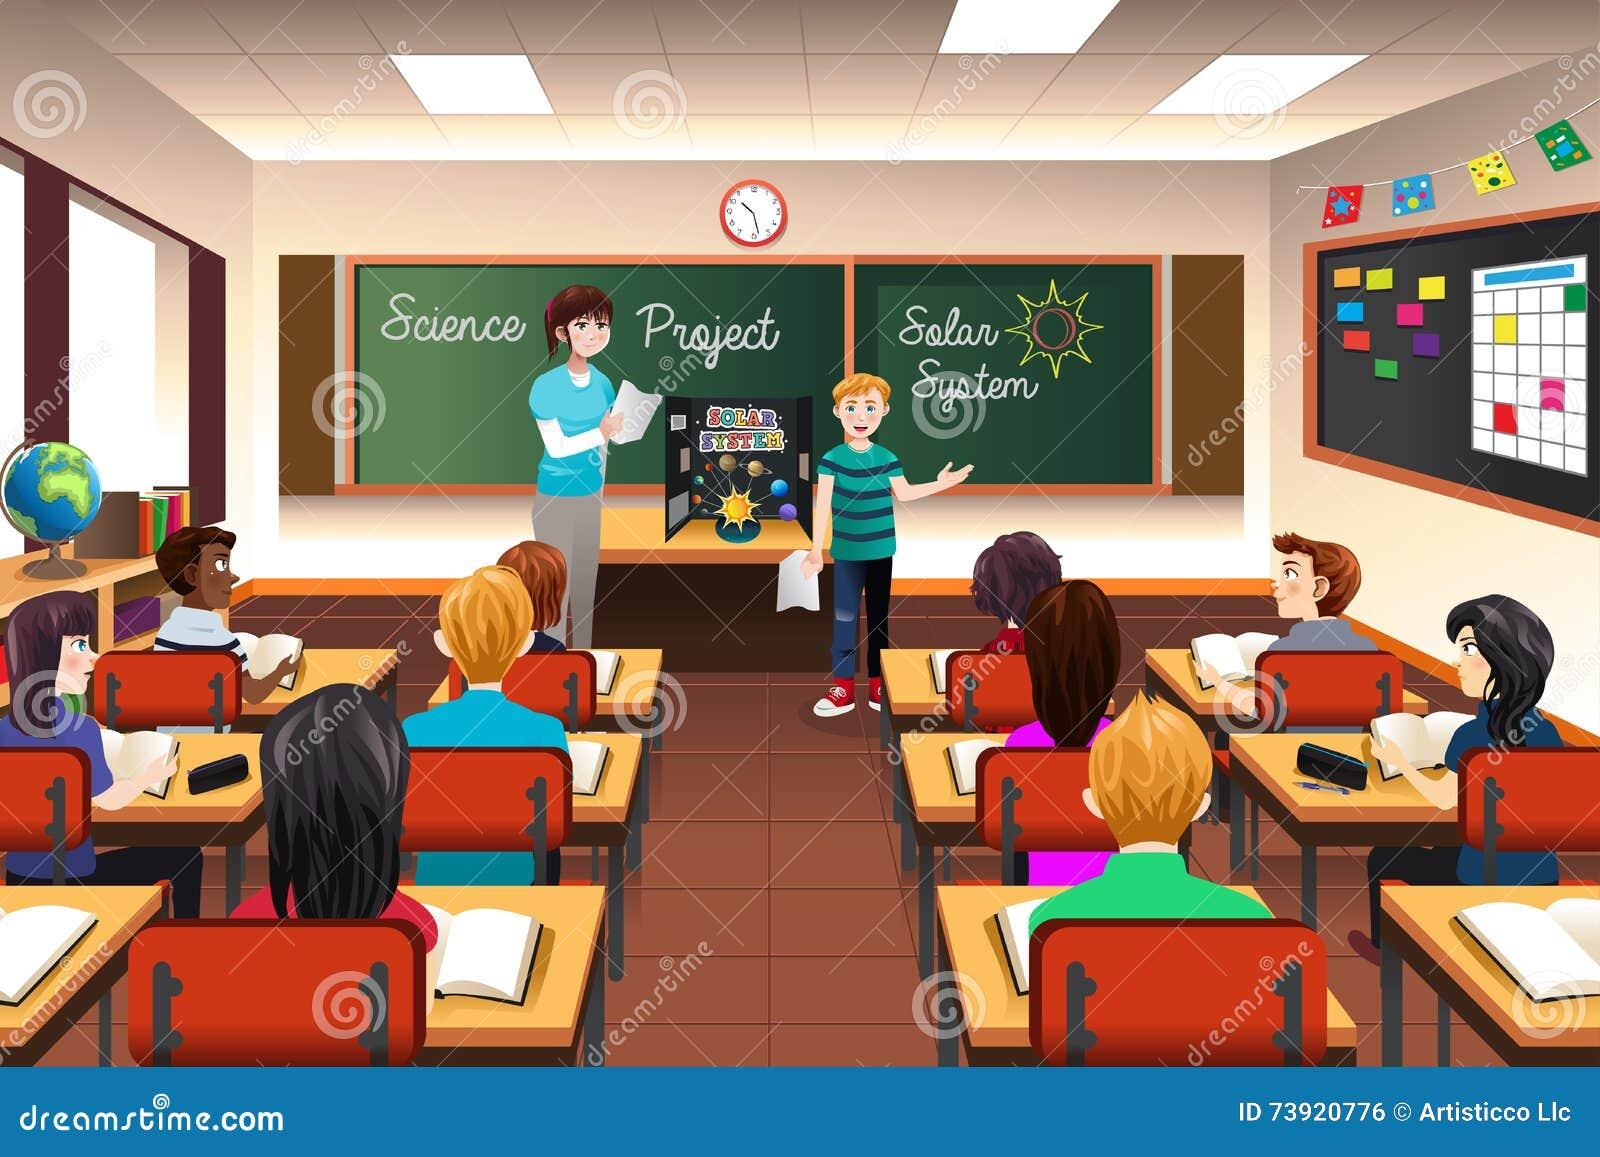 student having science presentation stock vector illustration of